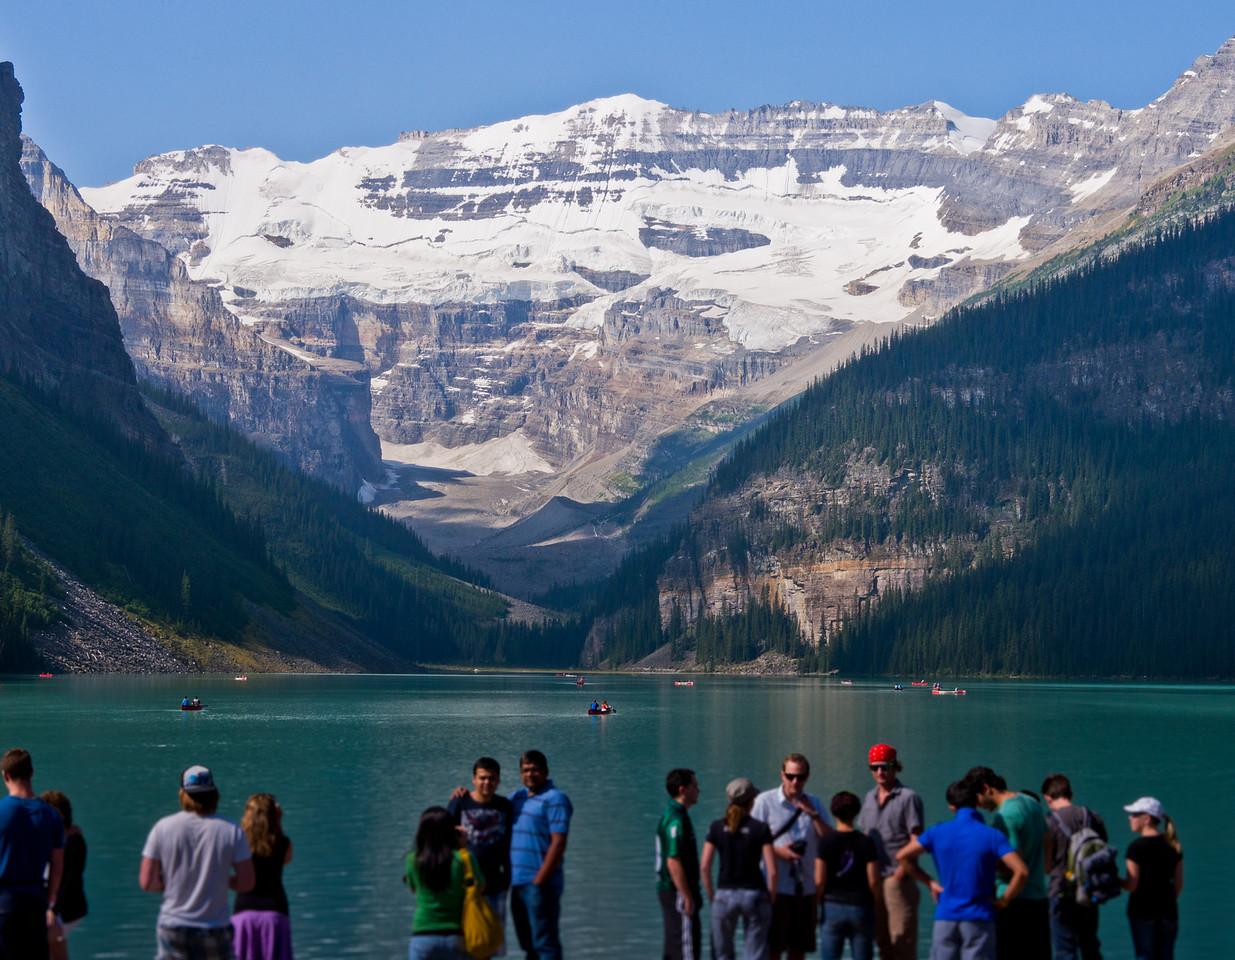 Touristes & lac Louise